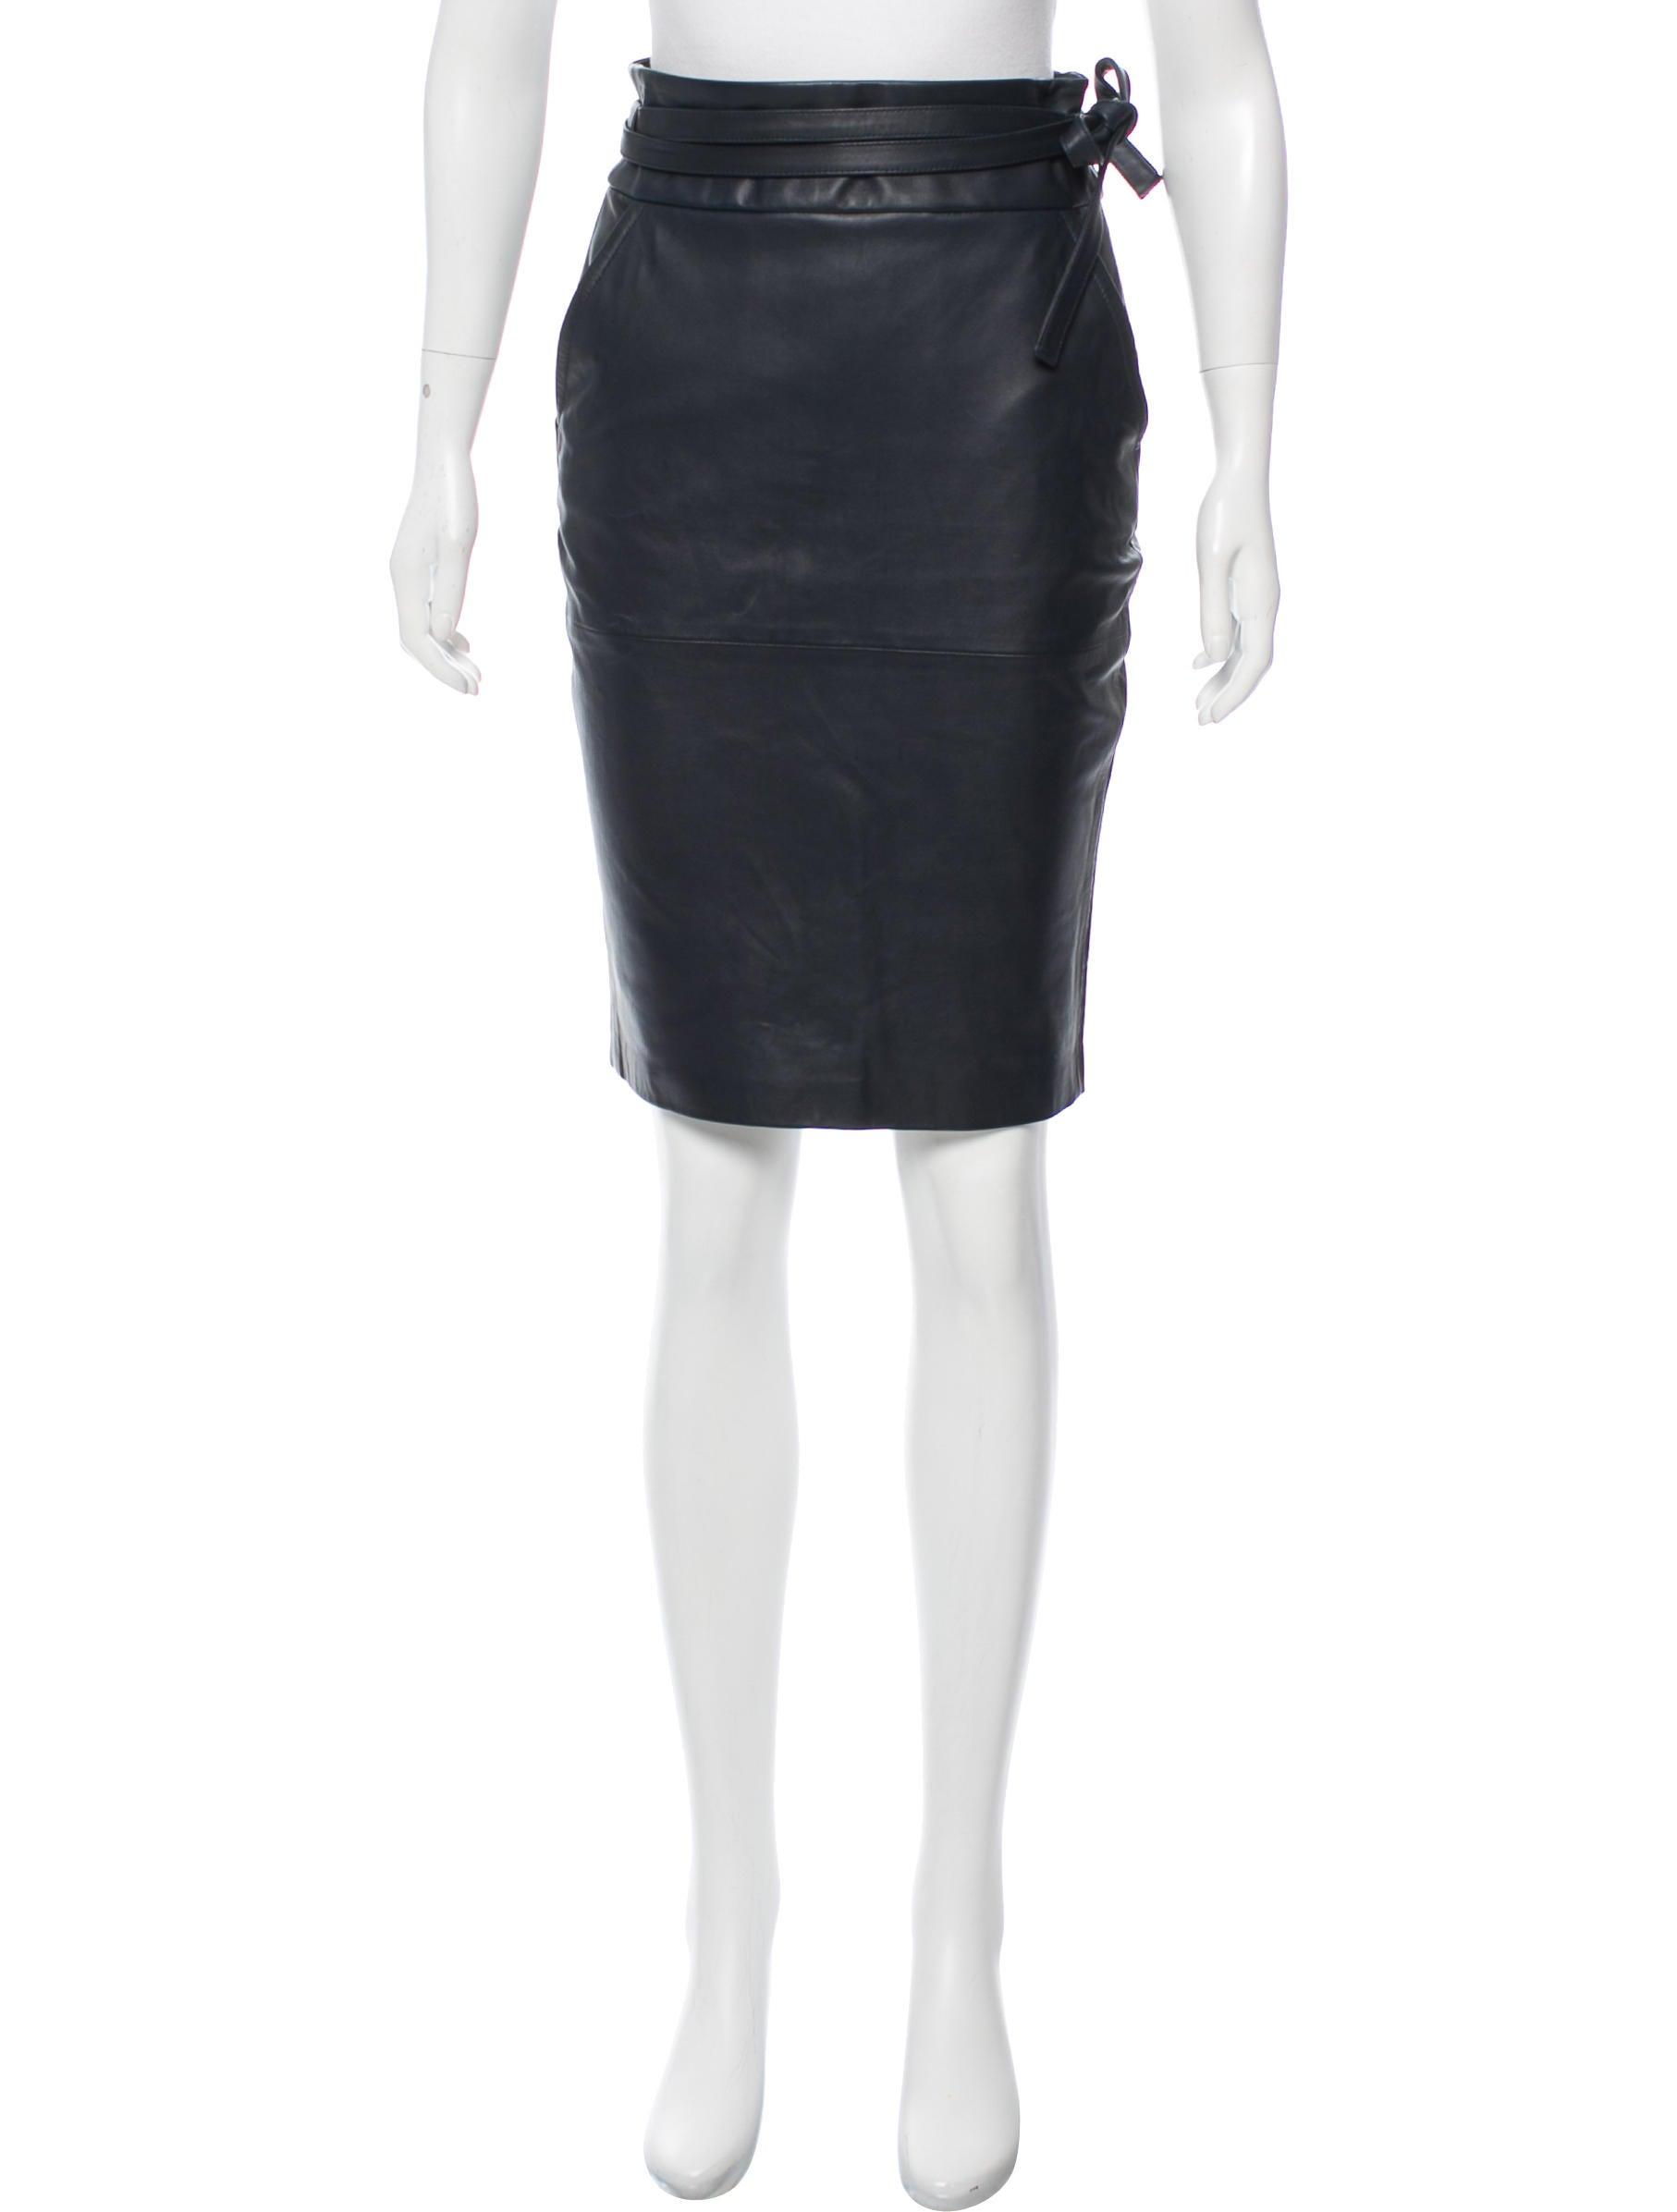 d4b1300dad4 Frame Denim Knee-Length Pencil Skirt - Clothing - WFD31121